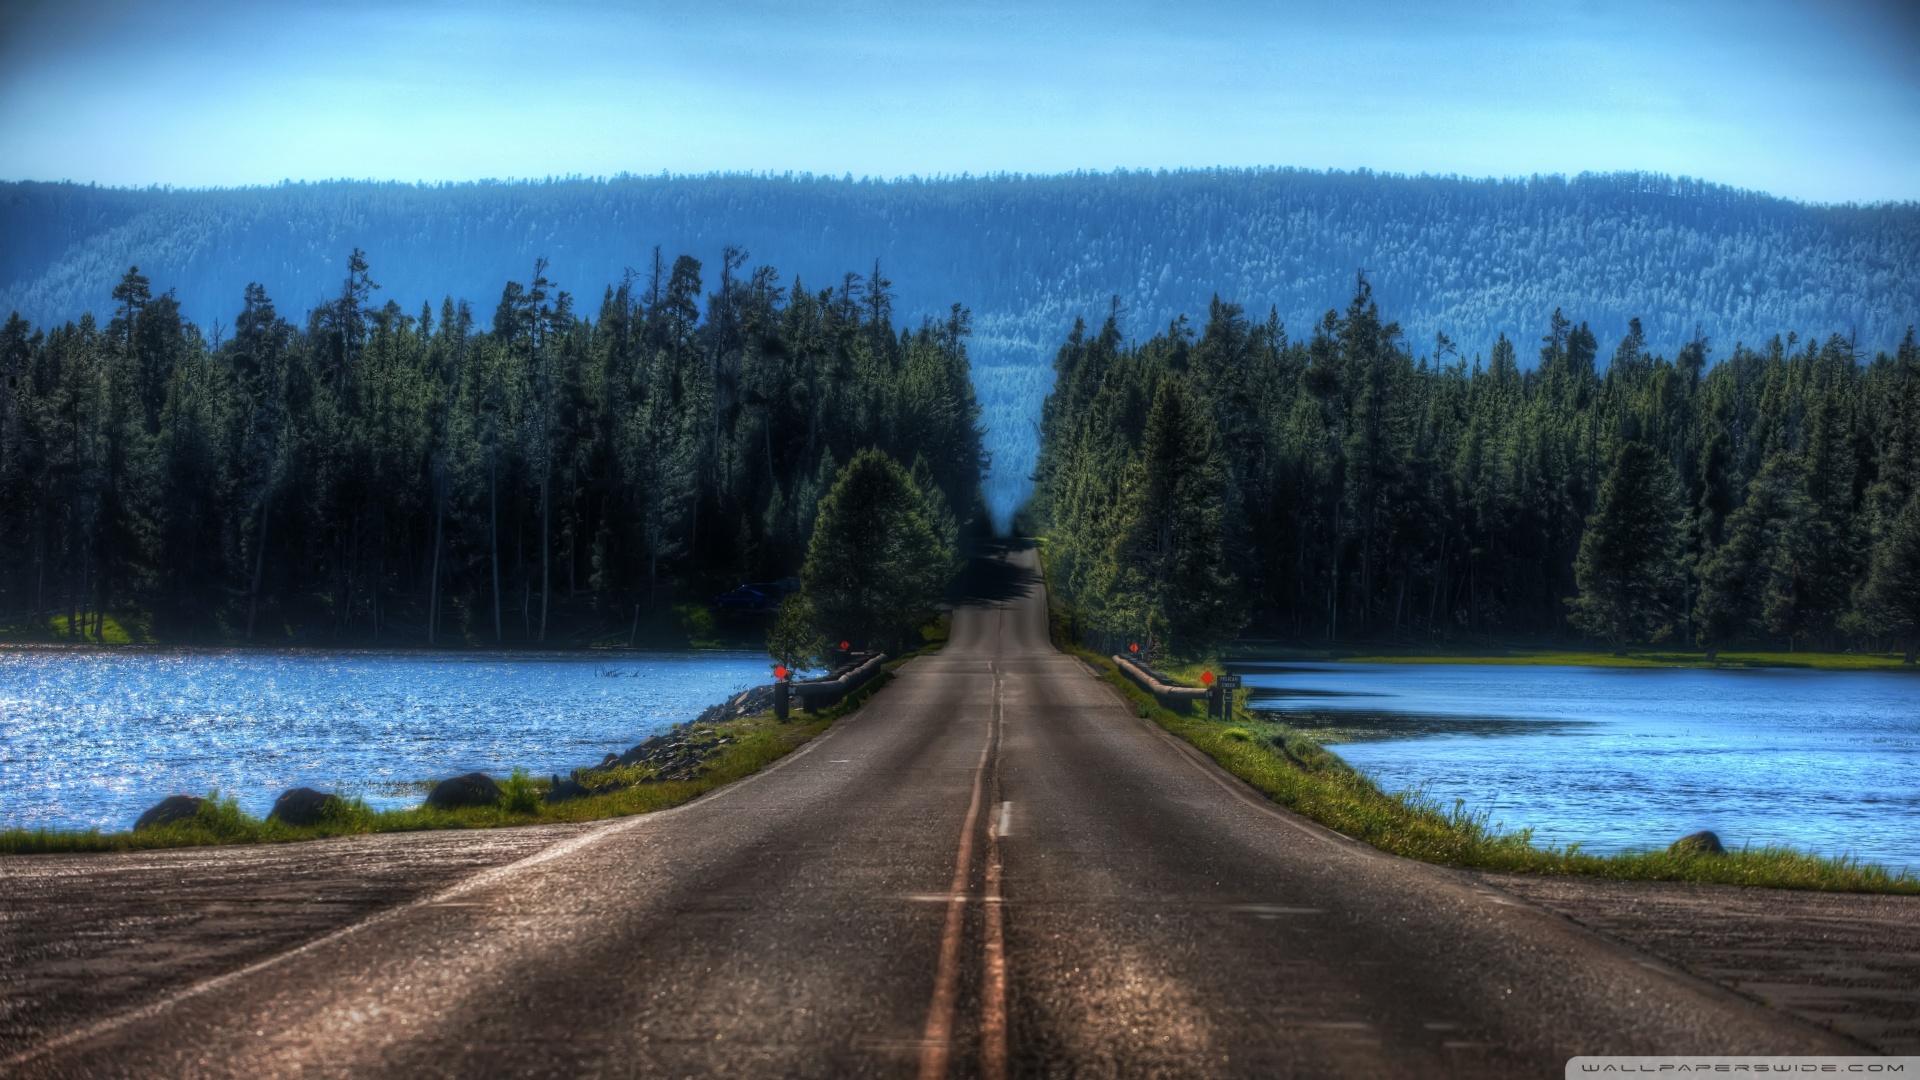 Yellowstone Wallpaper Widescreen - WallpaperSafari